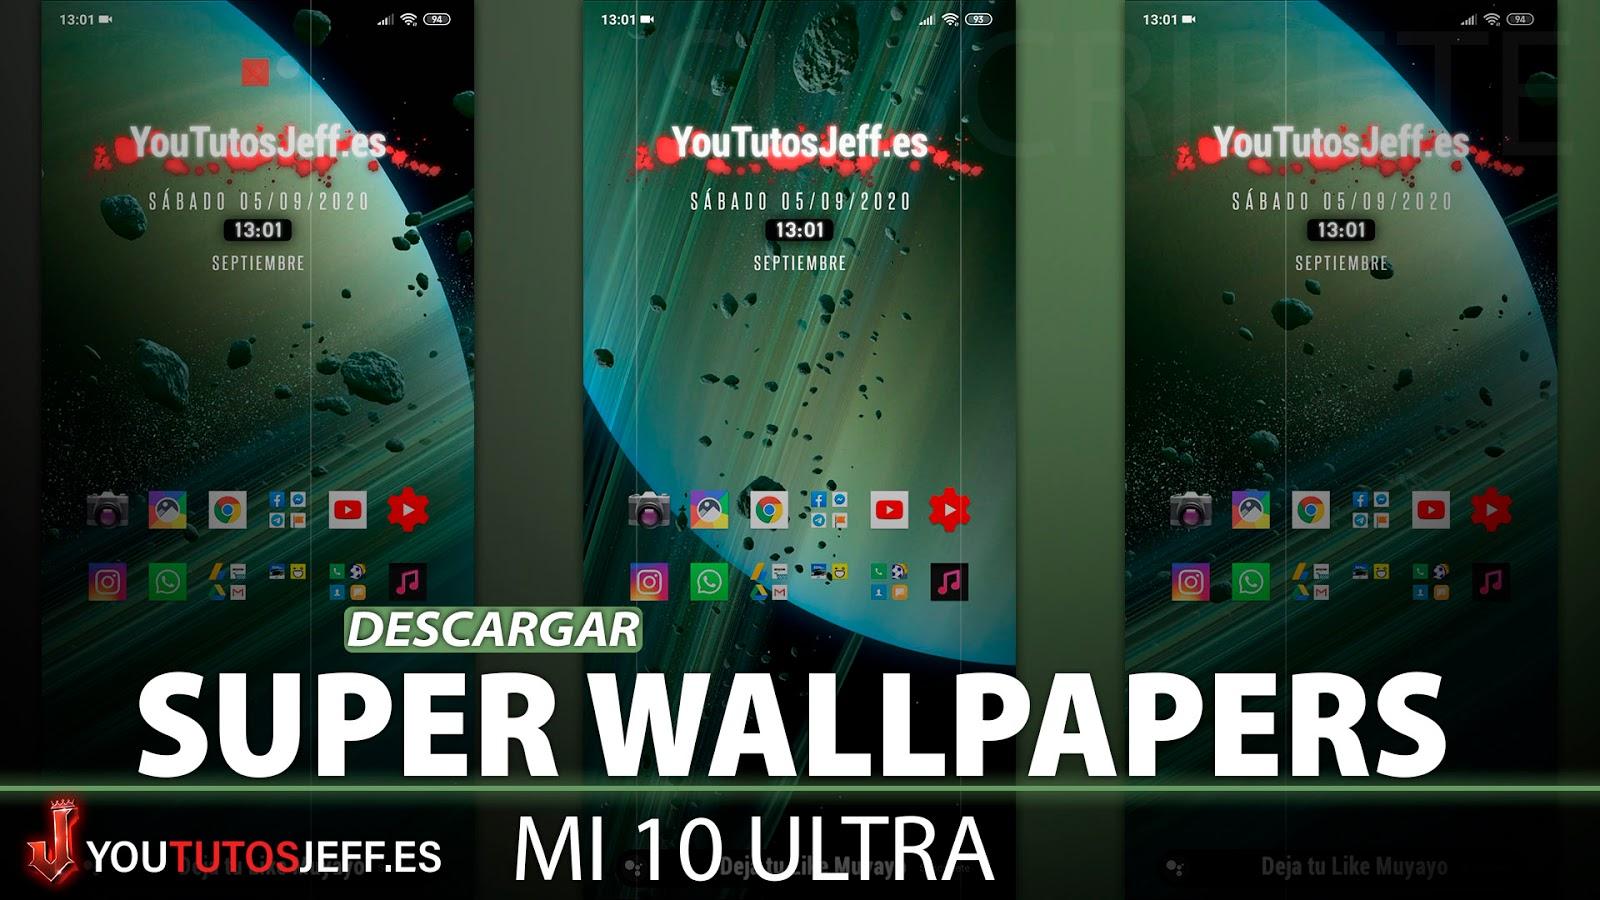 Como Descargar Super Wallpapers Xiaomi MI 10 ULTRA